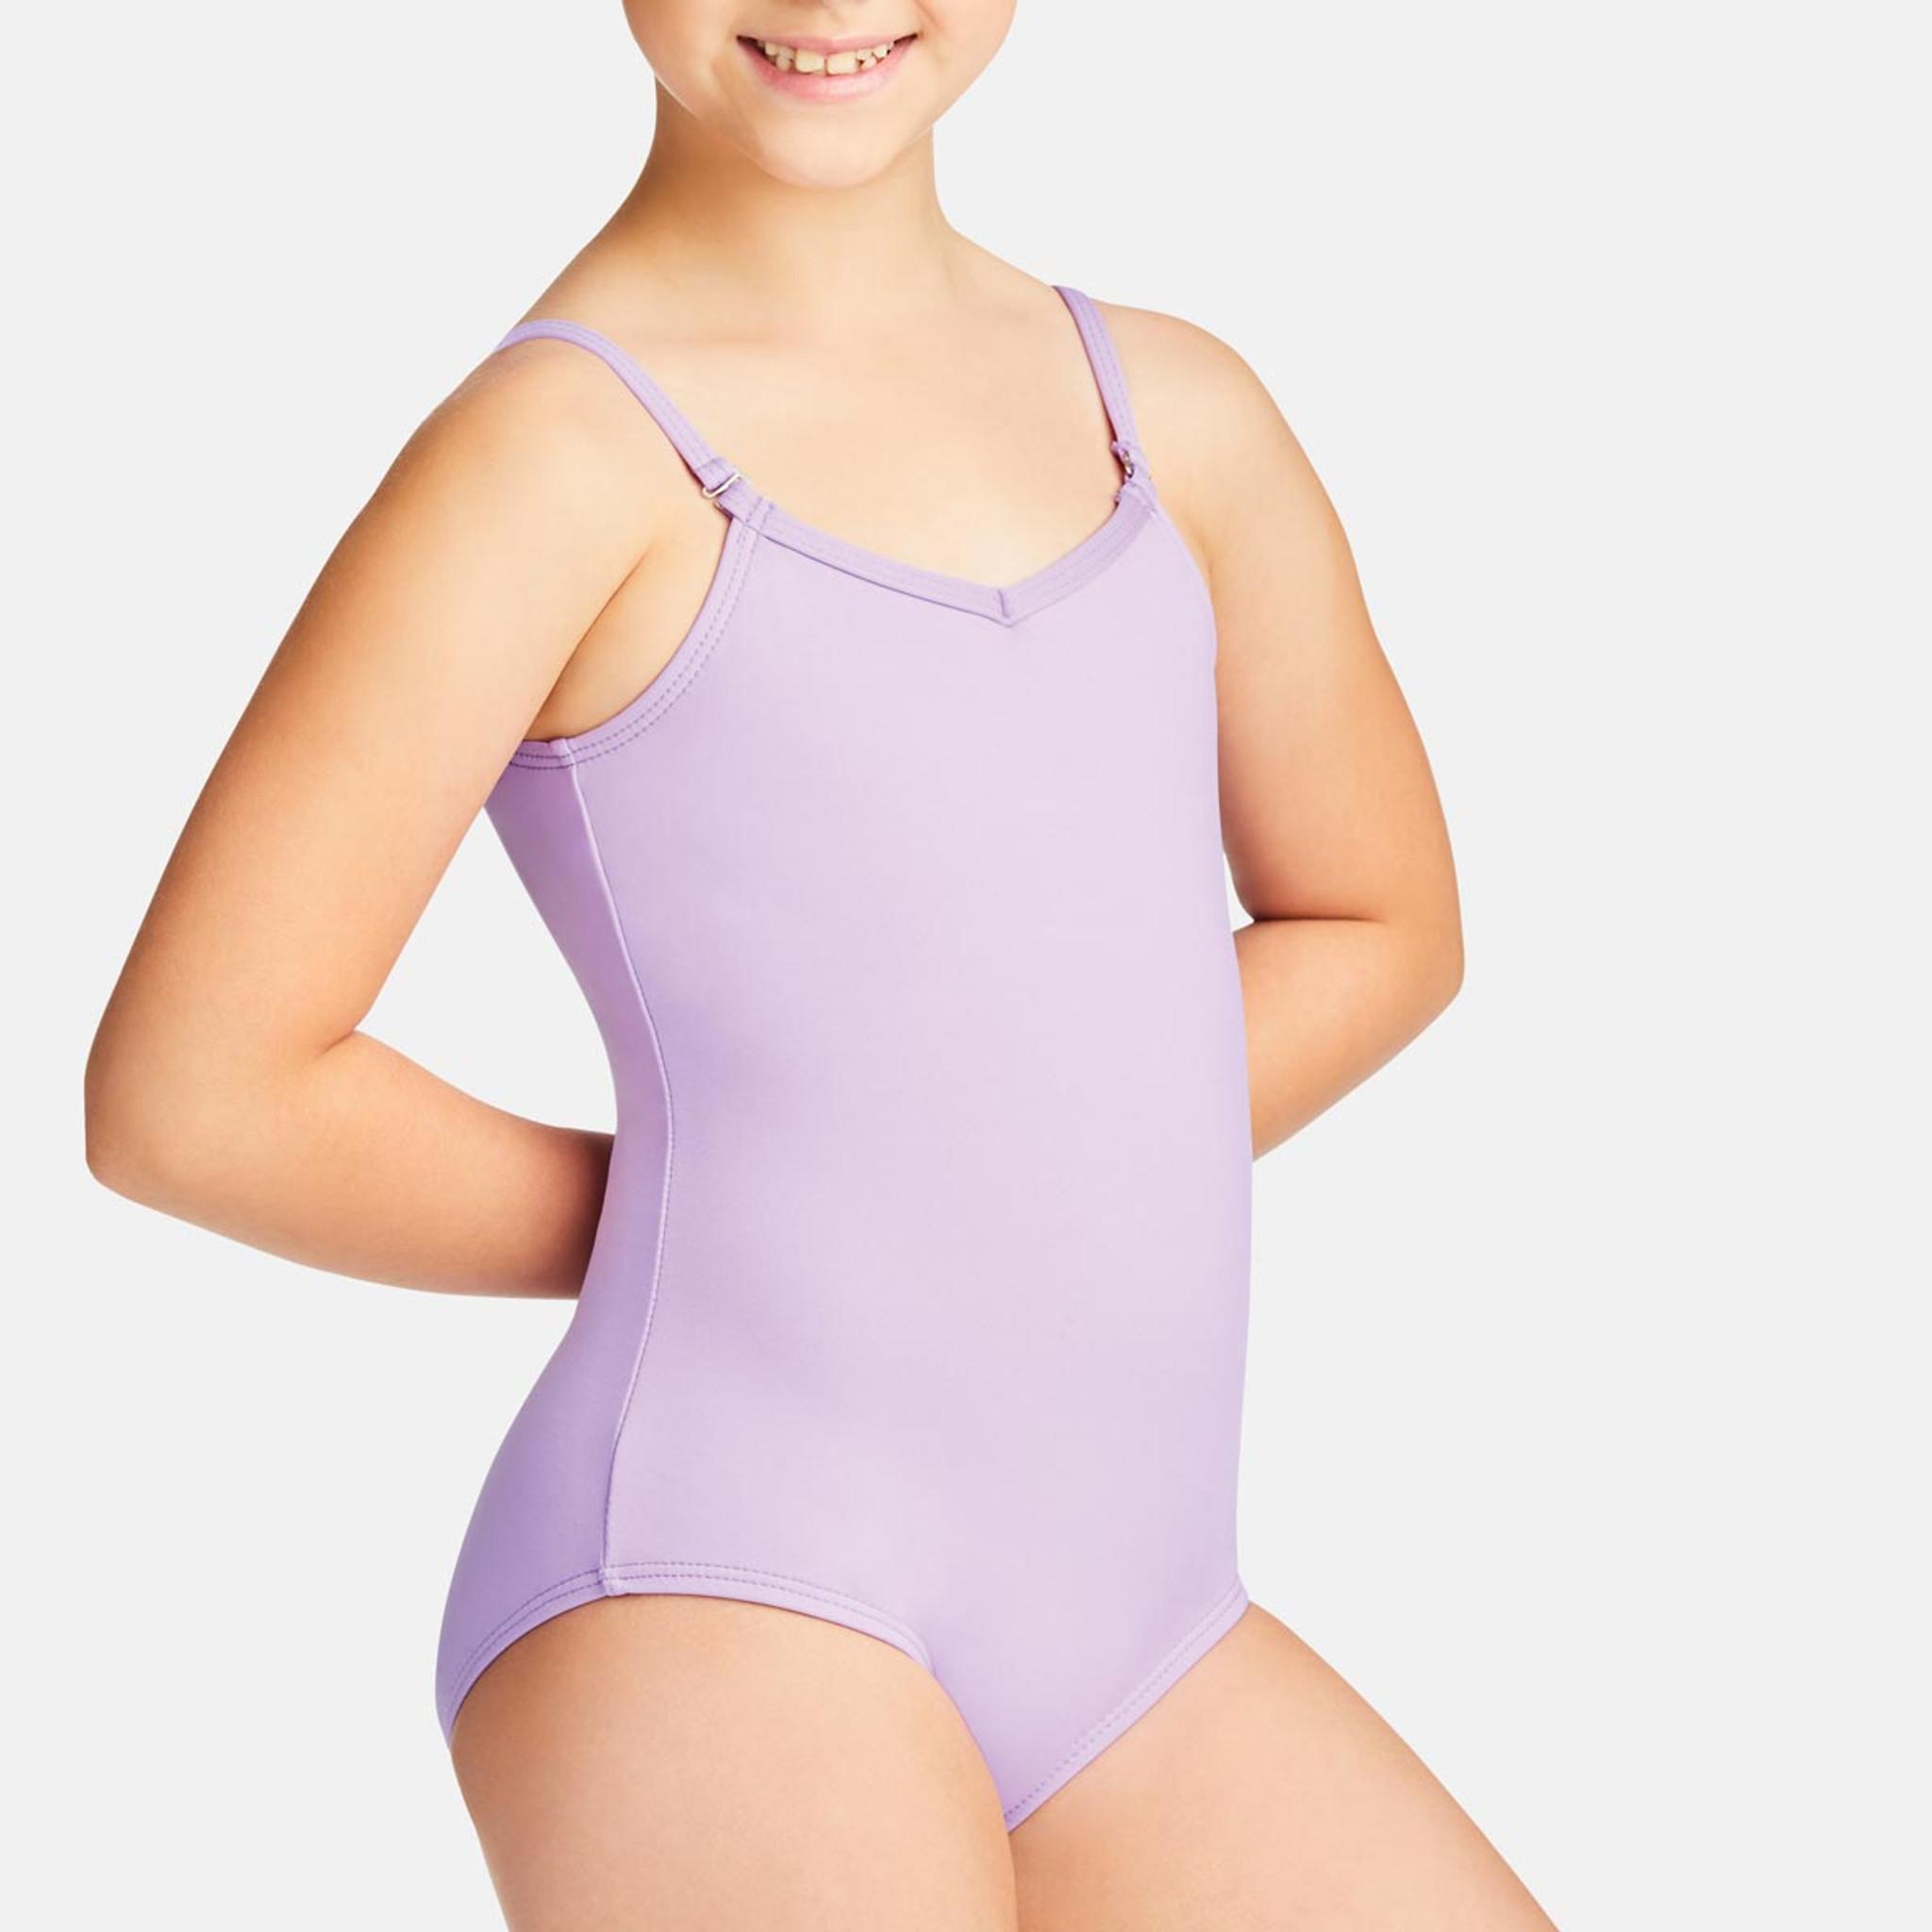 39e36c737 Capezio Camisole Leotard Adjustable Straps - Girls Leotard - DANCE ...